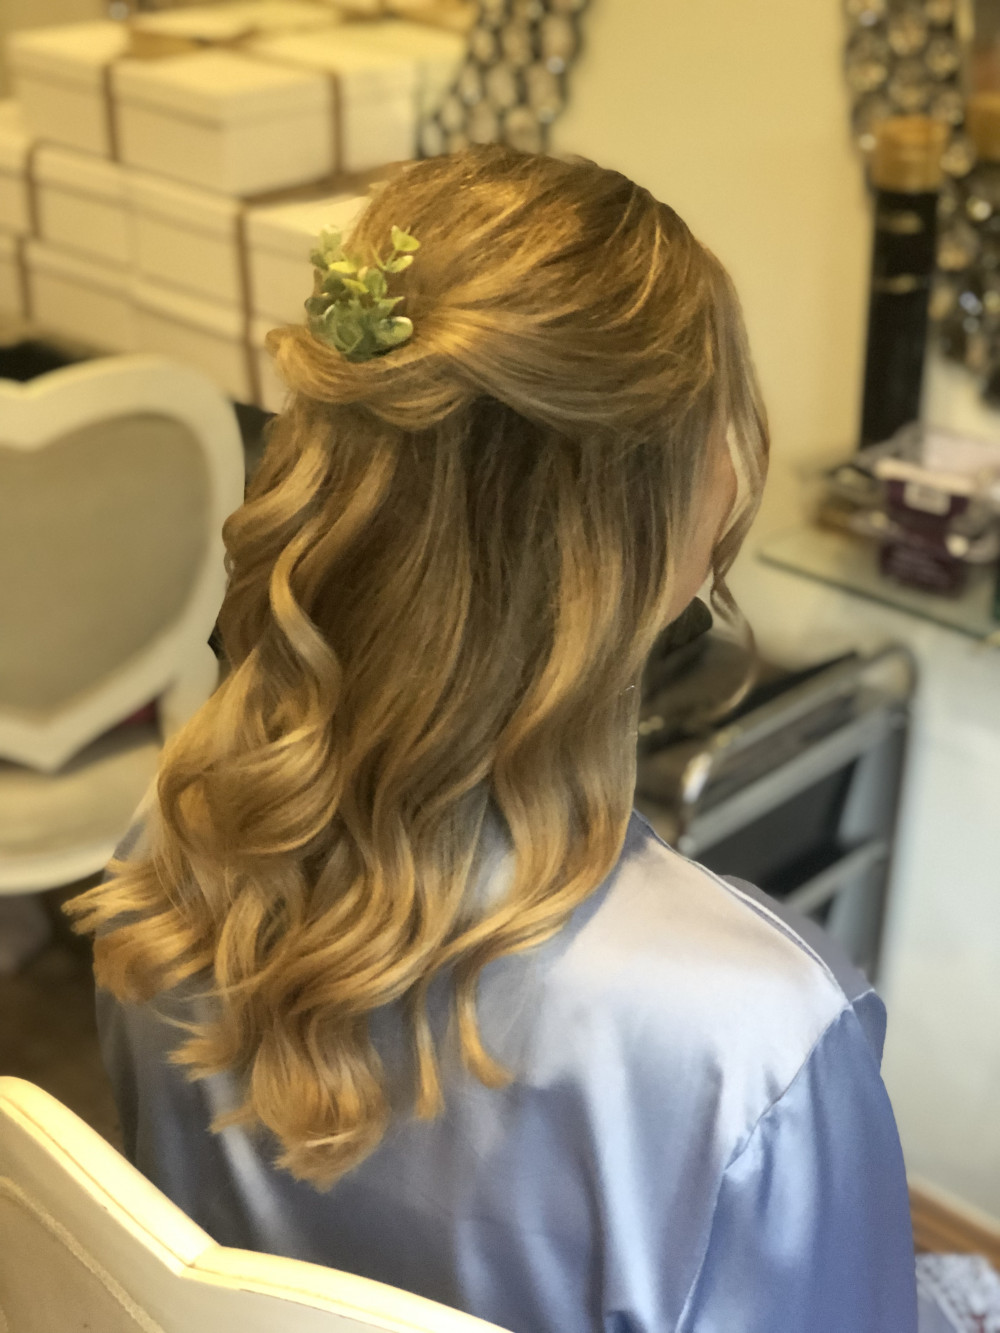 Bridesmaid Hair at Rivervale Barn in Surrey - Make Me Bridal Artist: Suzanne Dusek Hair & Makeup.